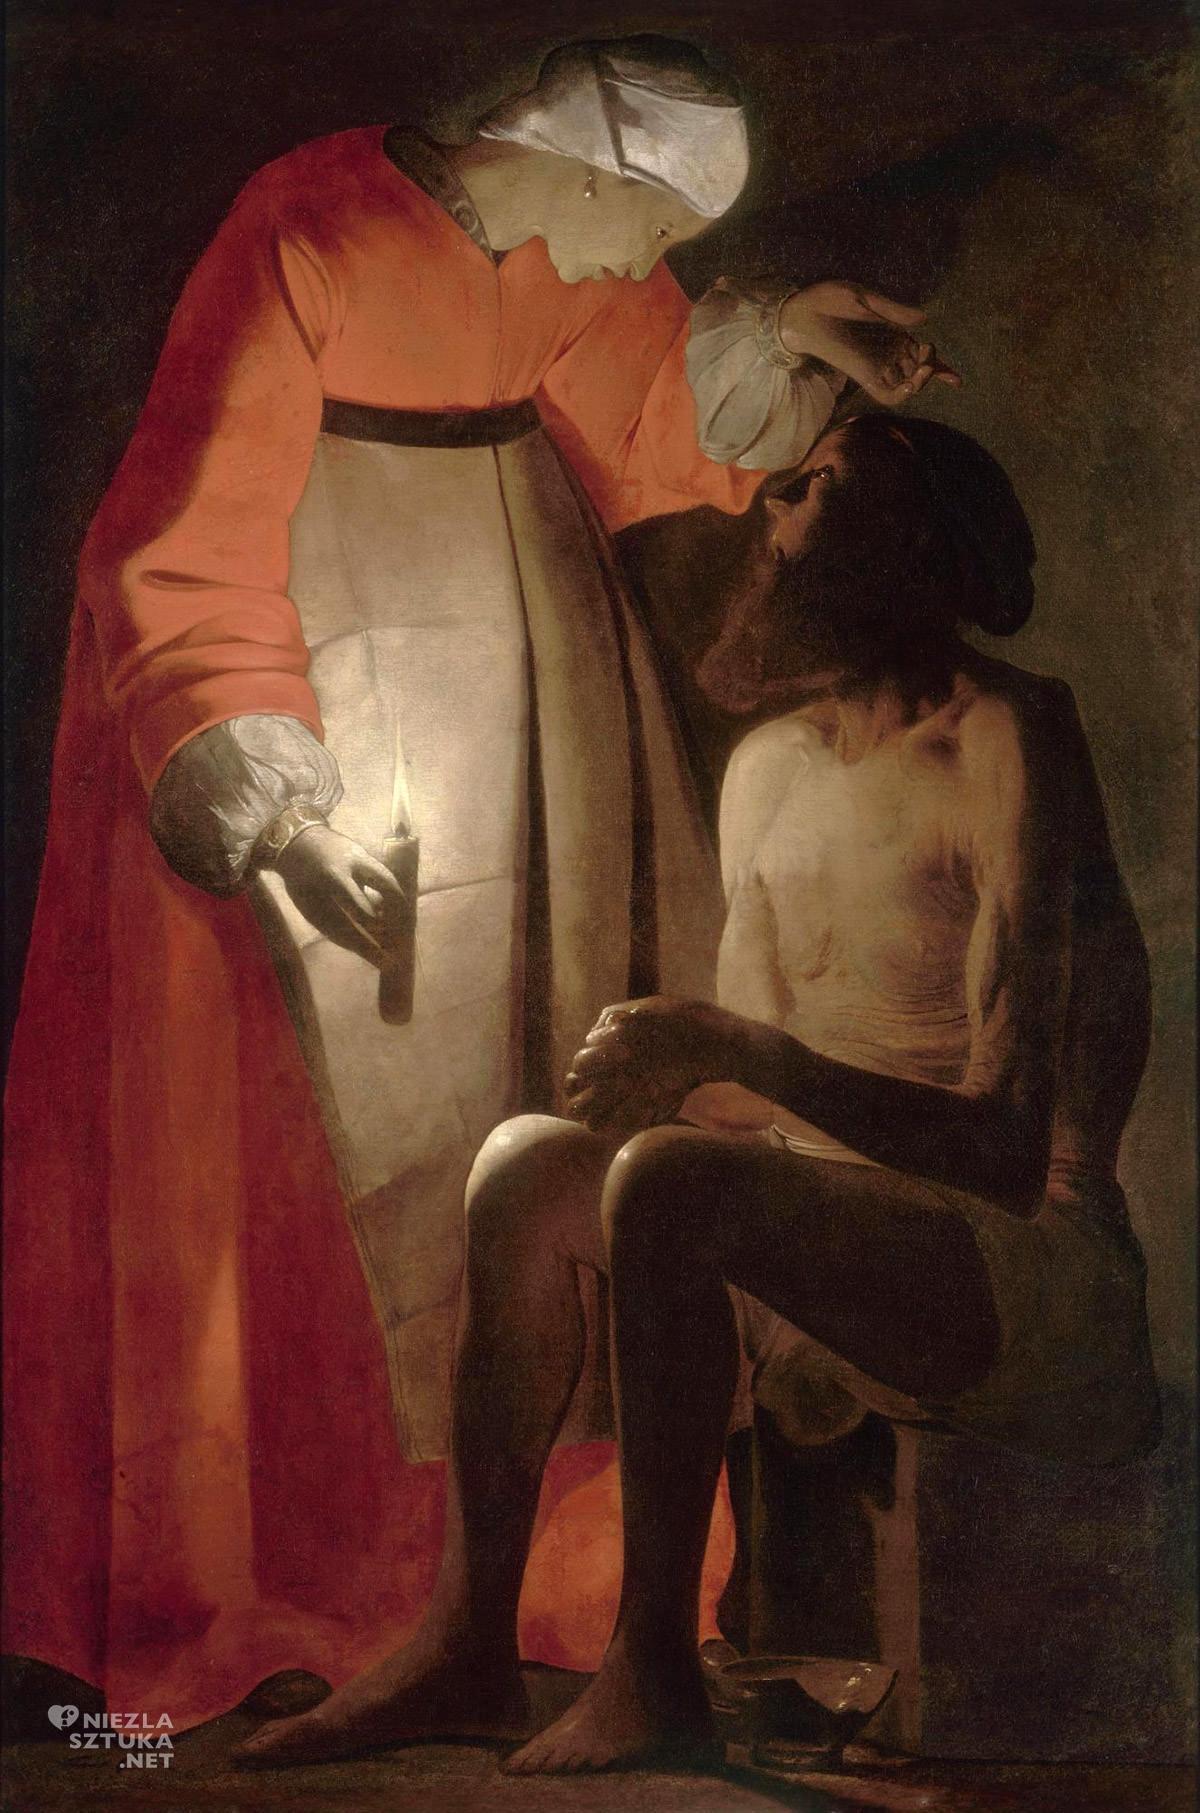 Georges de La Tour, Hiob z żoną, malarstwo religijne, sztuka francuska, barok, Niezła Sztuka